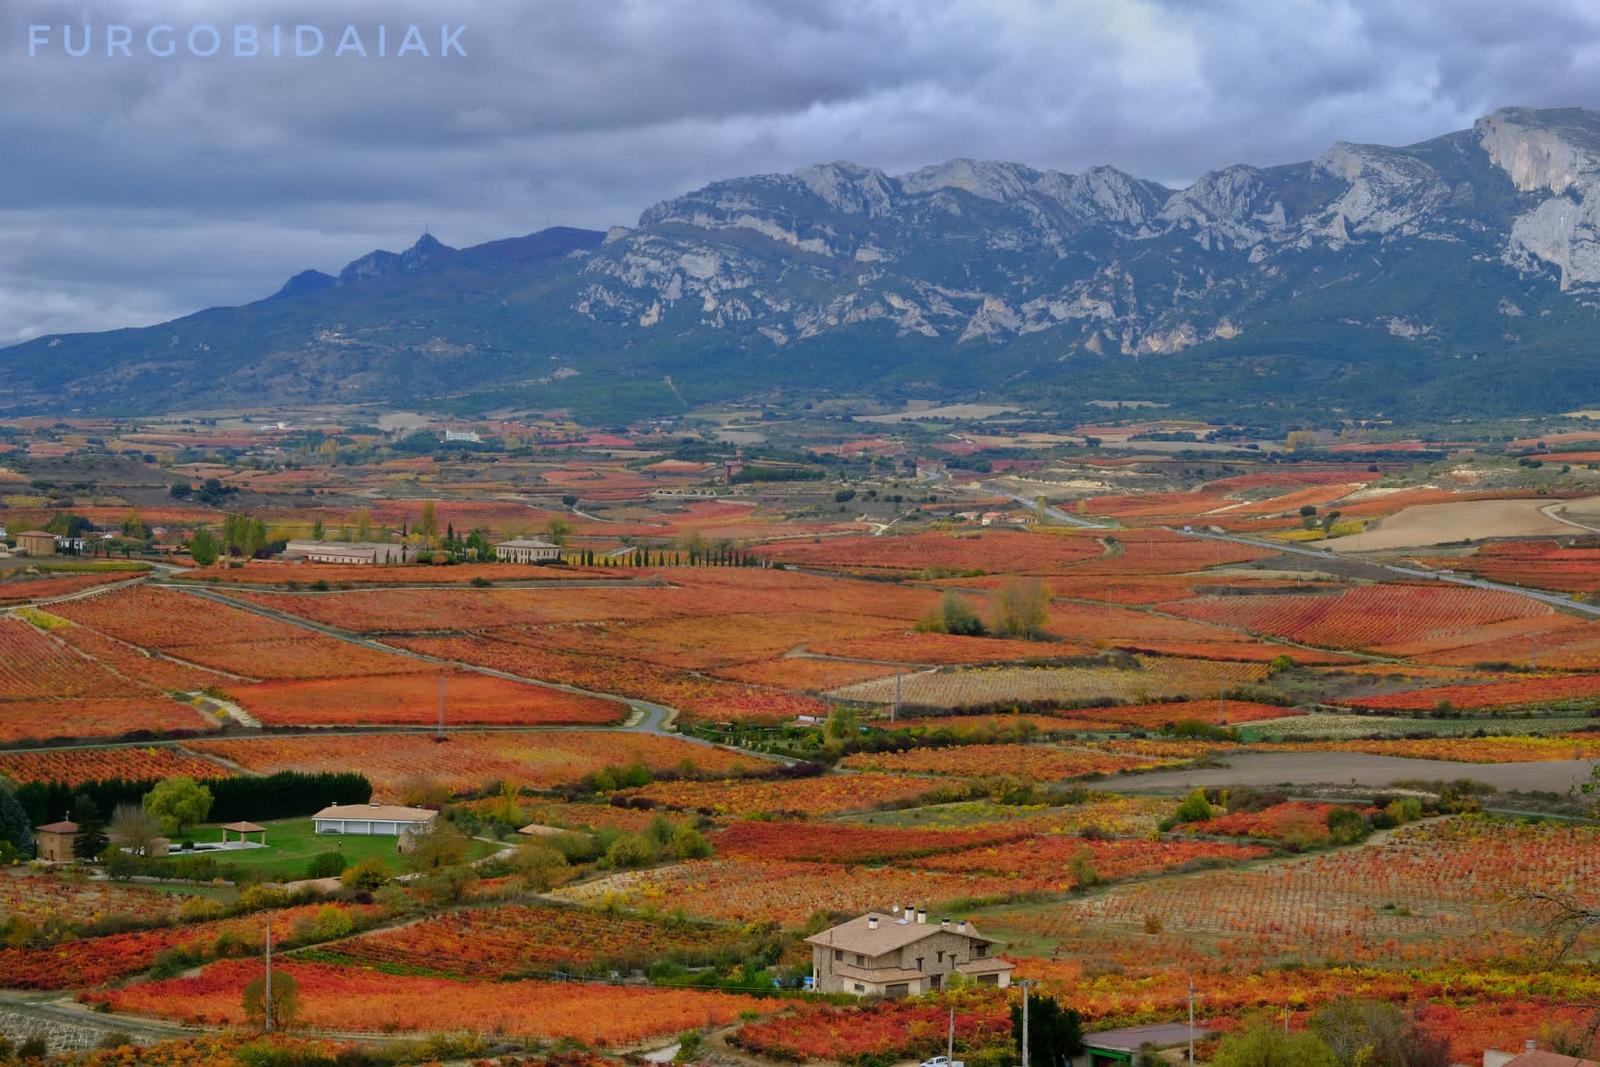 Mirador de Laguardia, Rioja Alavesa